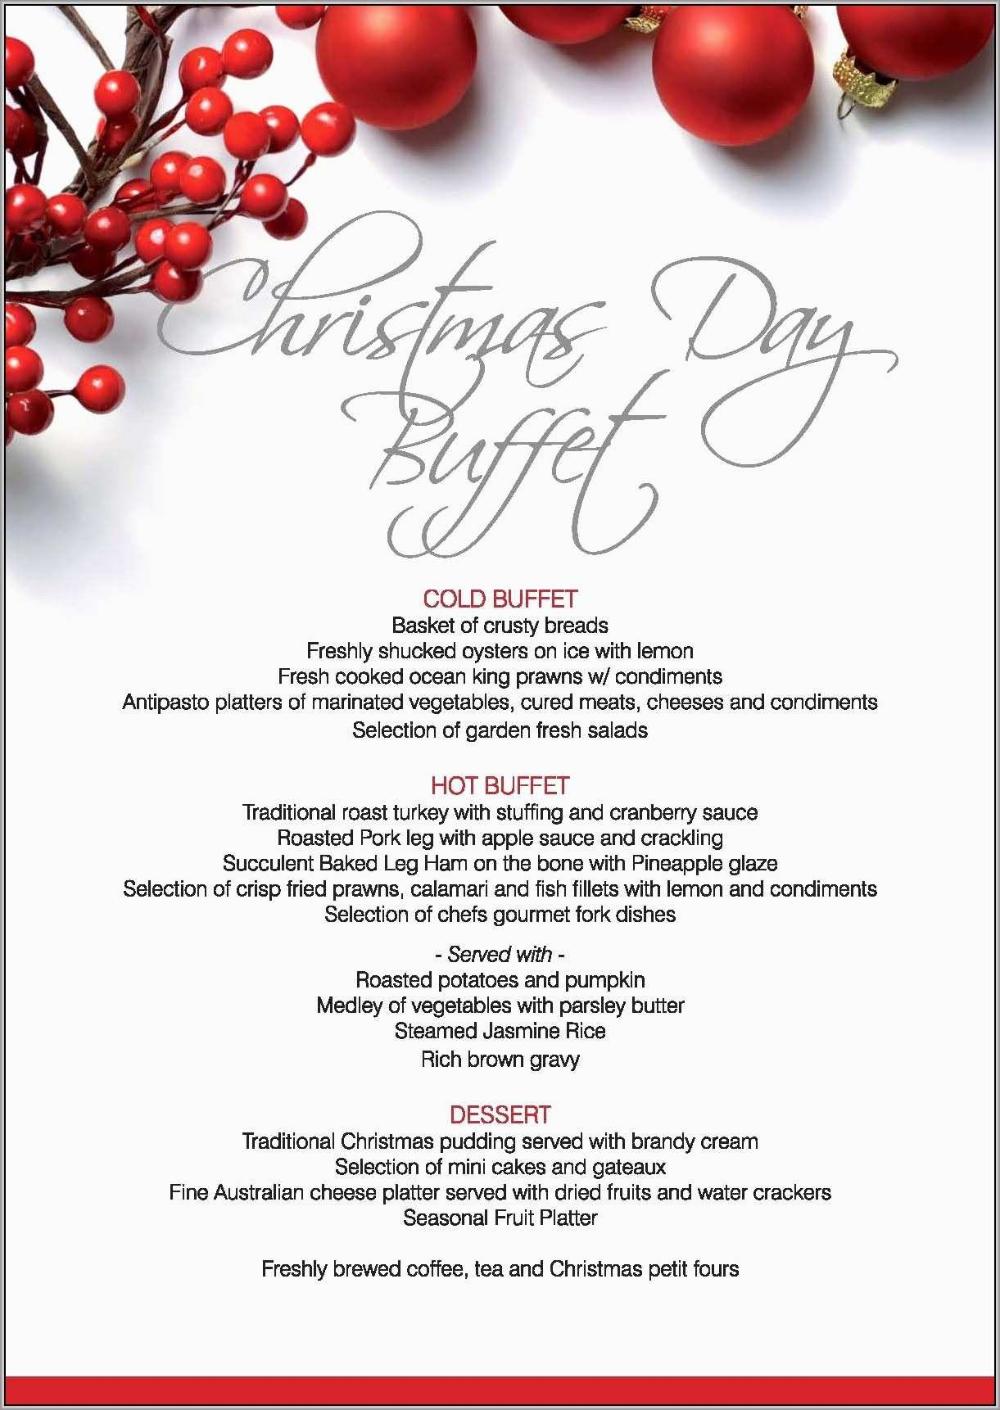 Awesome Free Printable Holiday Menu Template Best Of Template Within Christmas Day Menu Template 10 Profes Menu Template Christmas Dinner Menu Holiday Menus